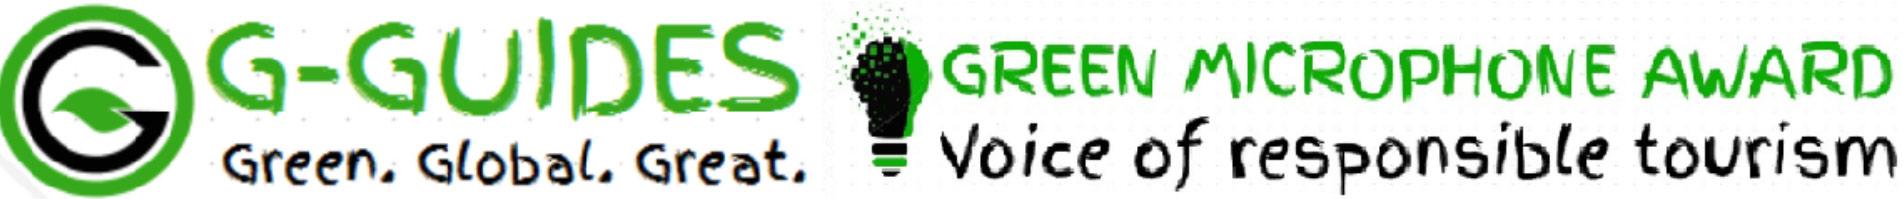 Green Microphone Award